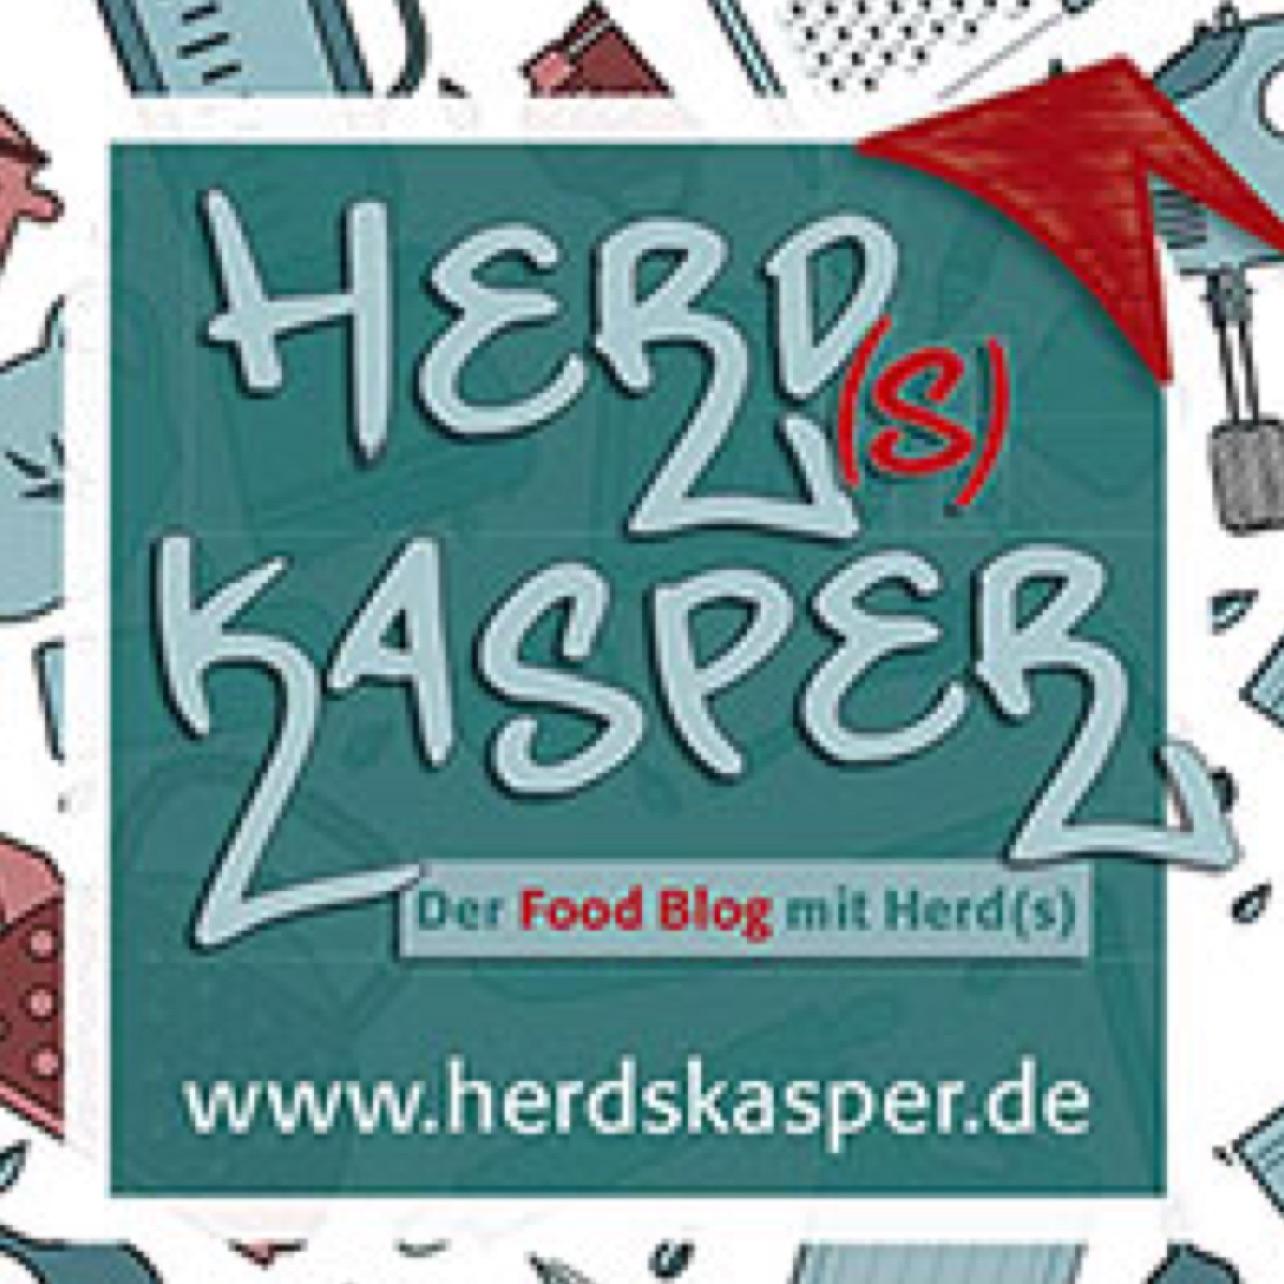 Image of Herd(s)Kasper